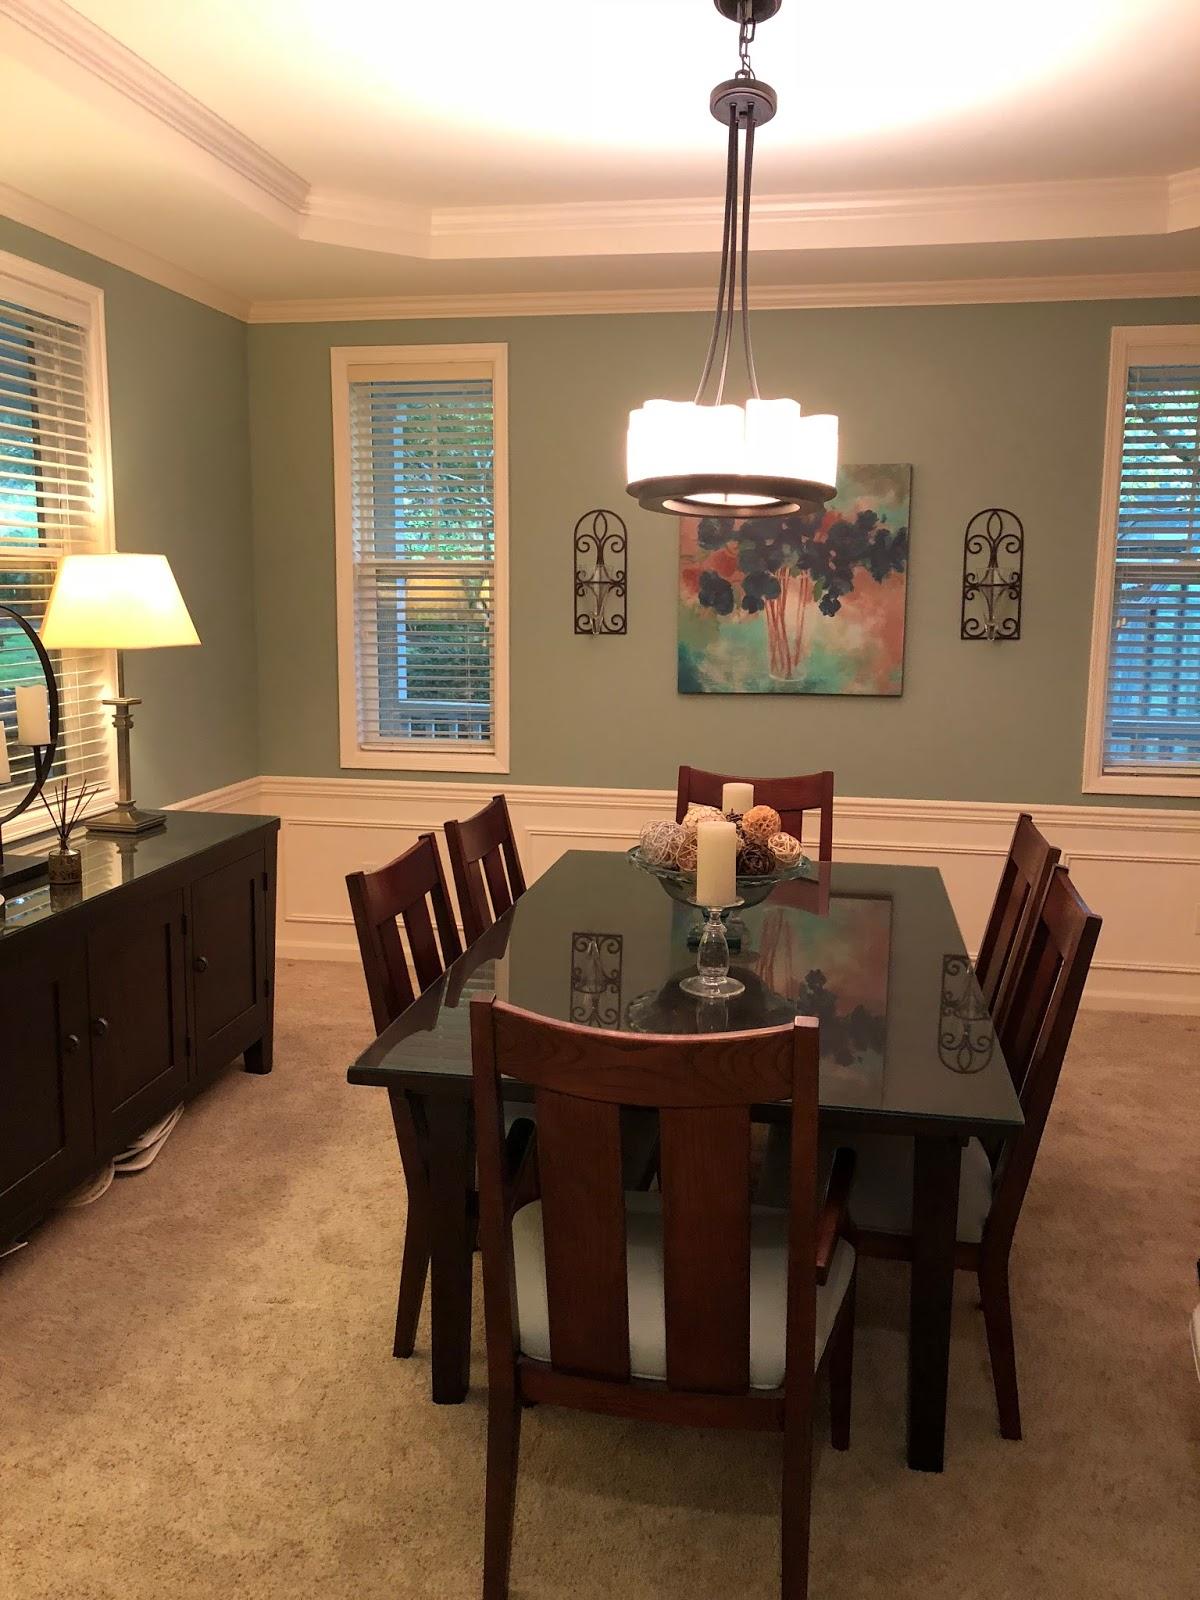 Walk through dining room